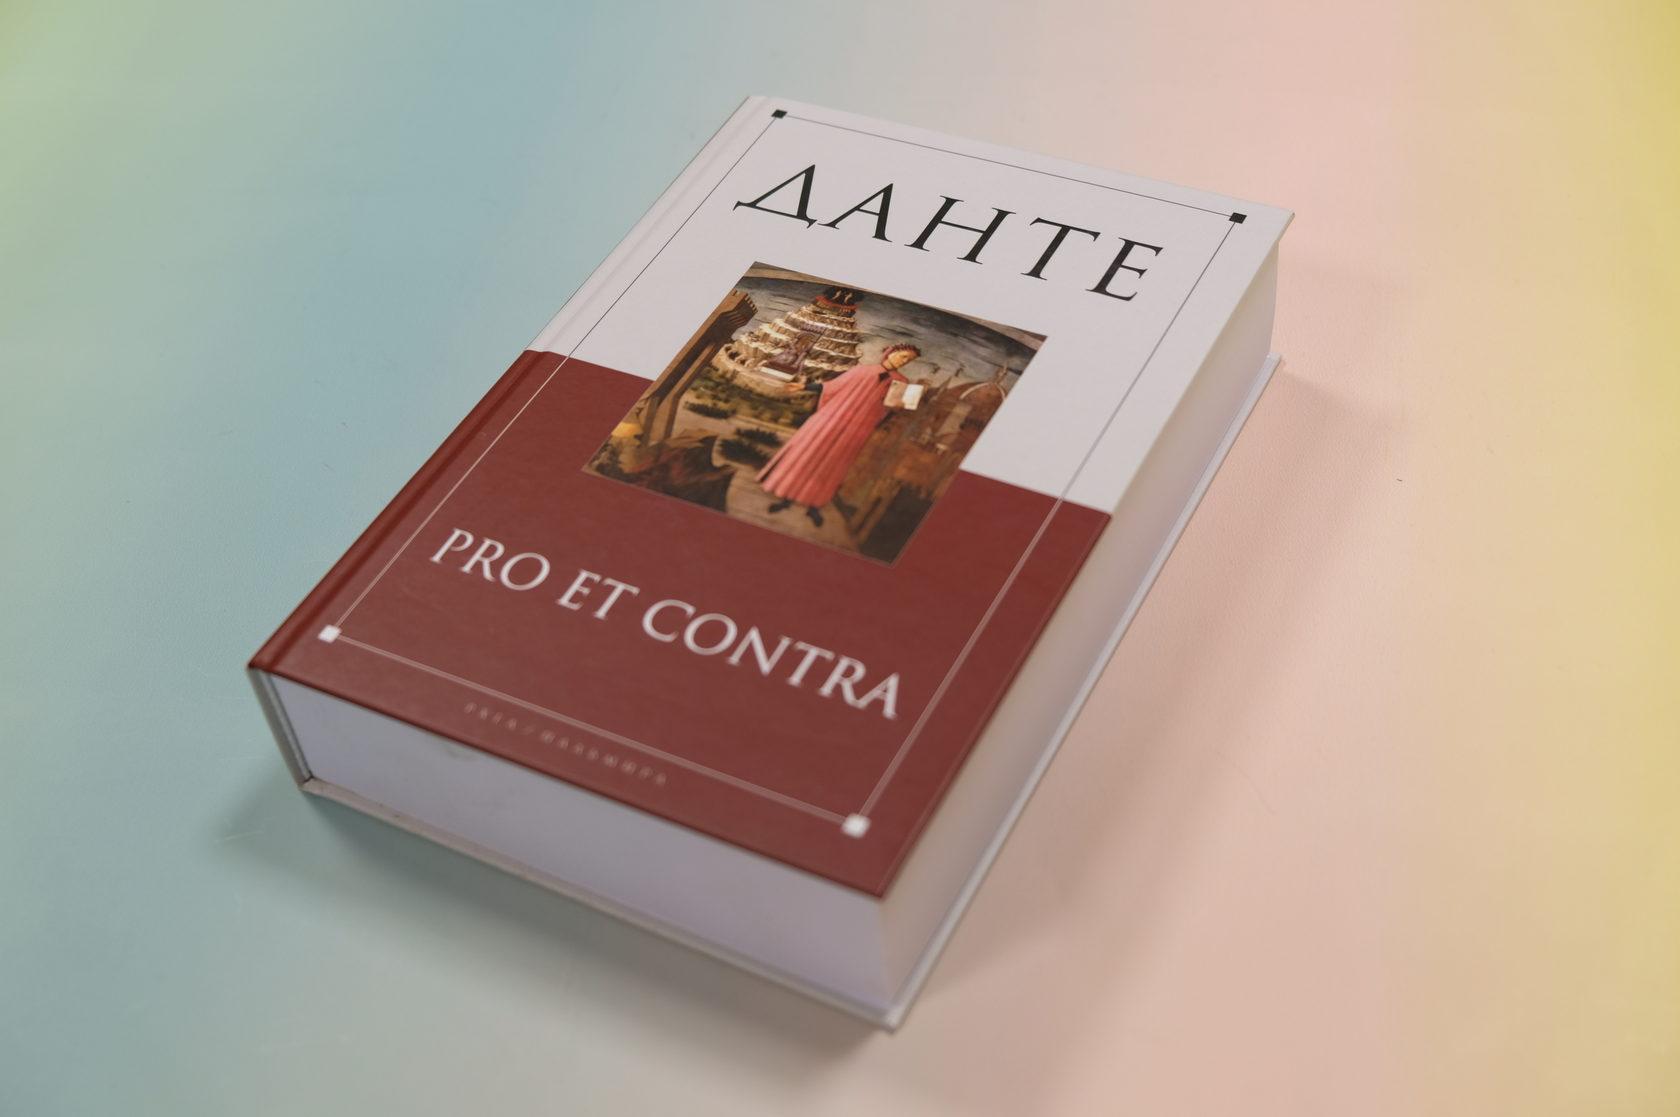 «Данте: Pro et contra»